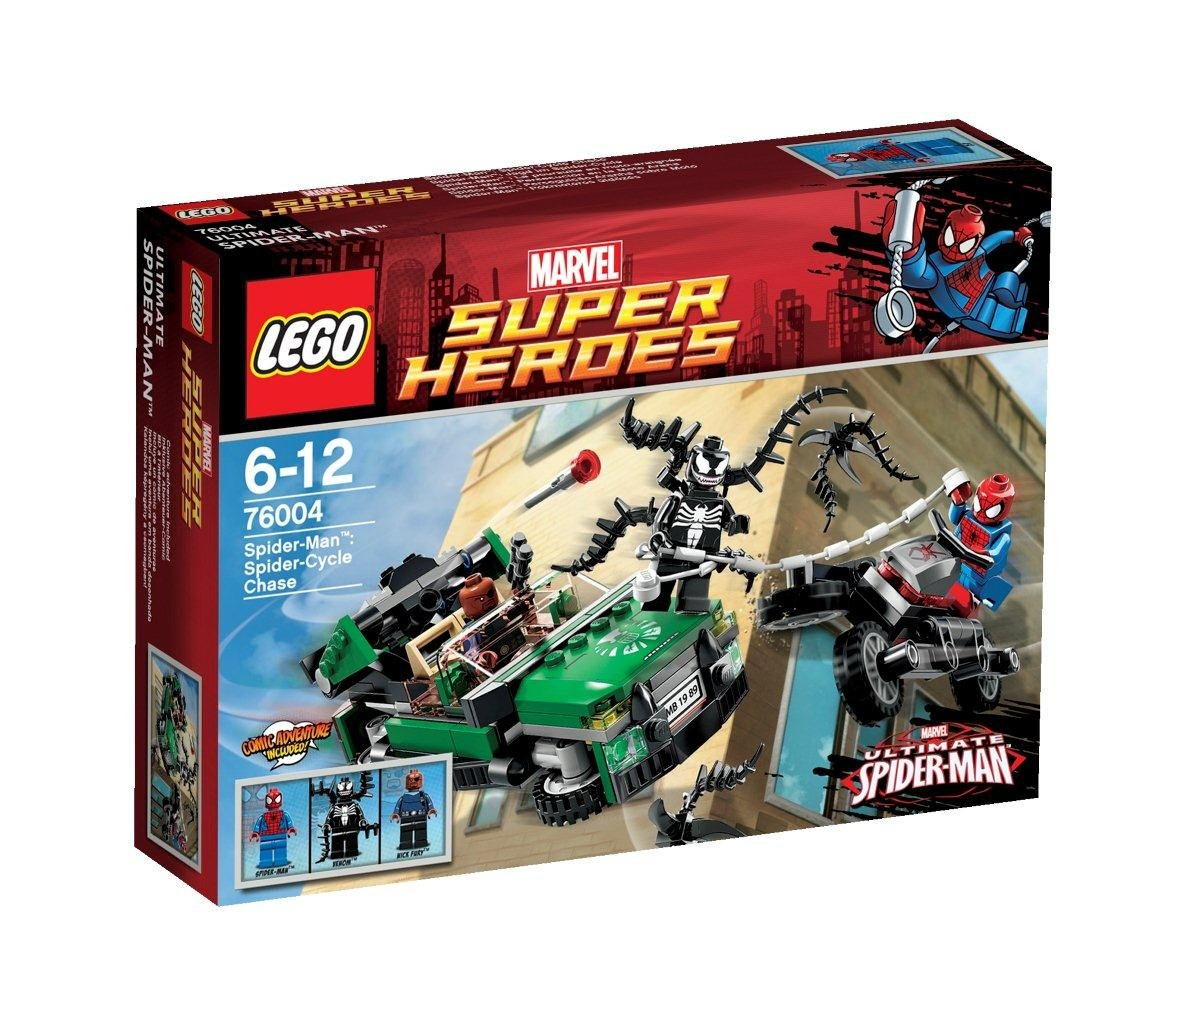 LEGO 76004 - Spider-Man, Jagd im Spider-Cycle